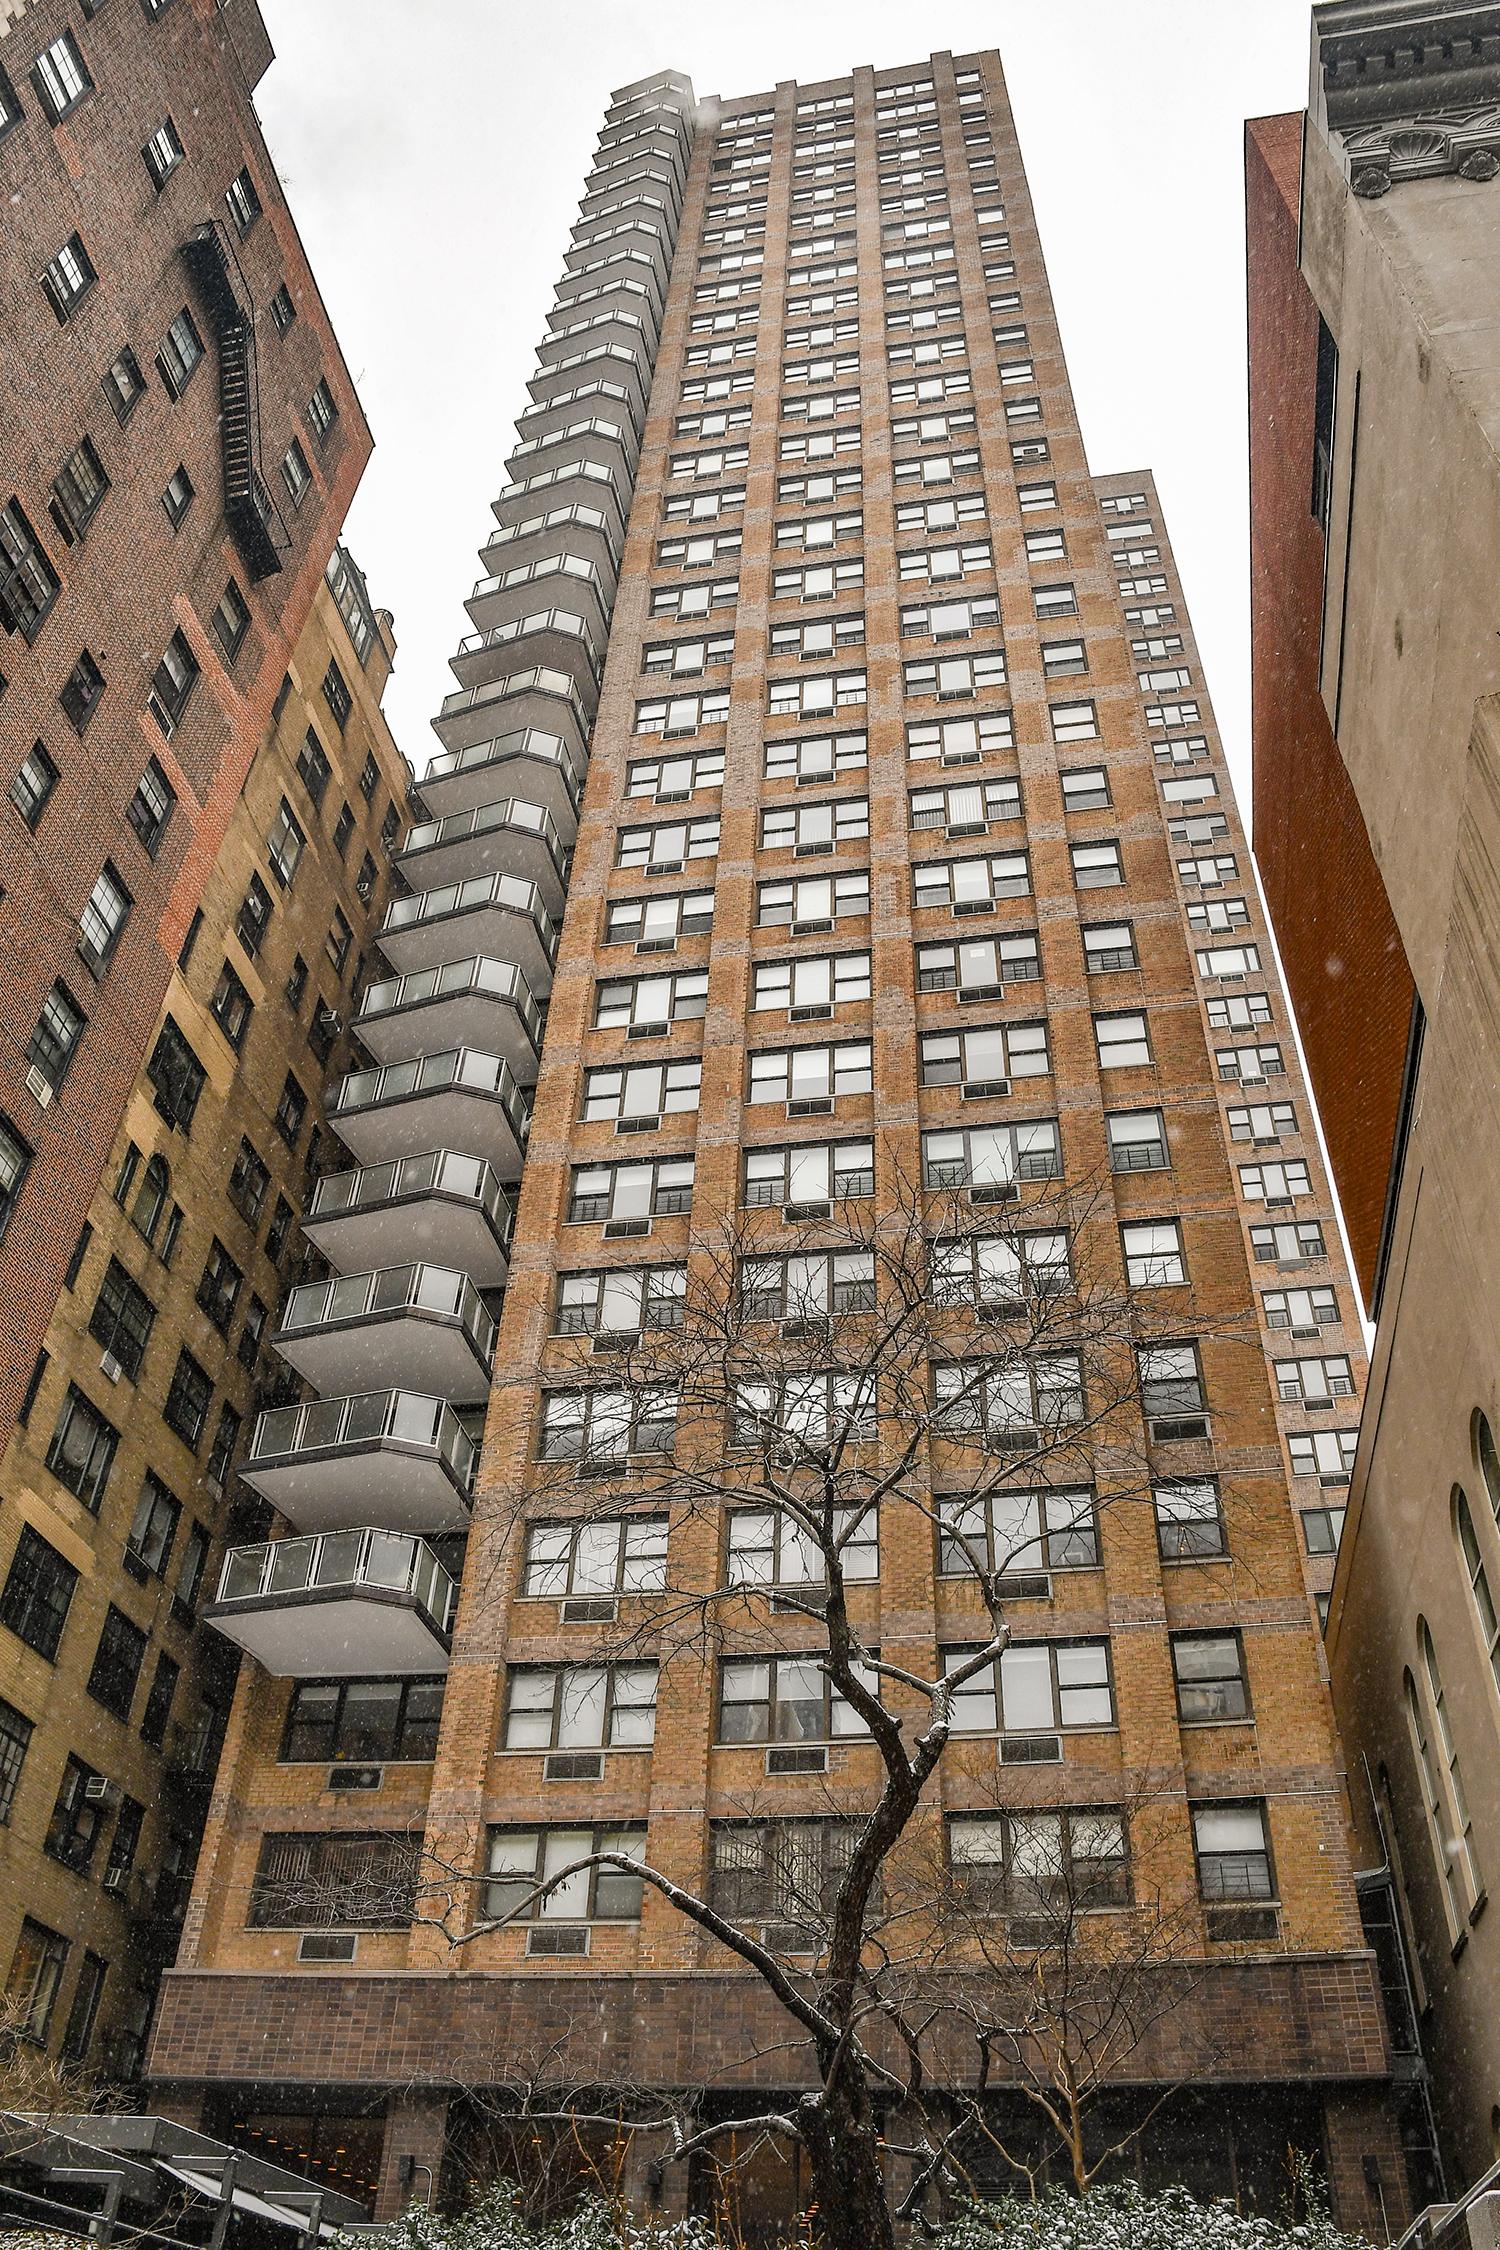 111 east 85th street -